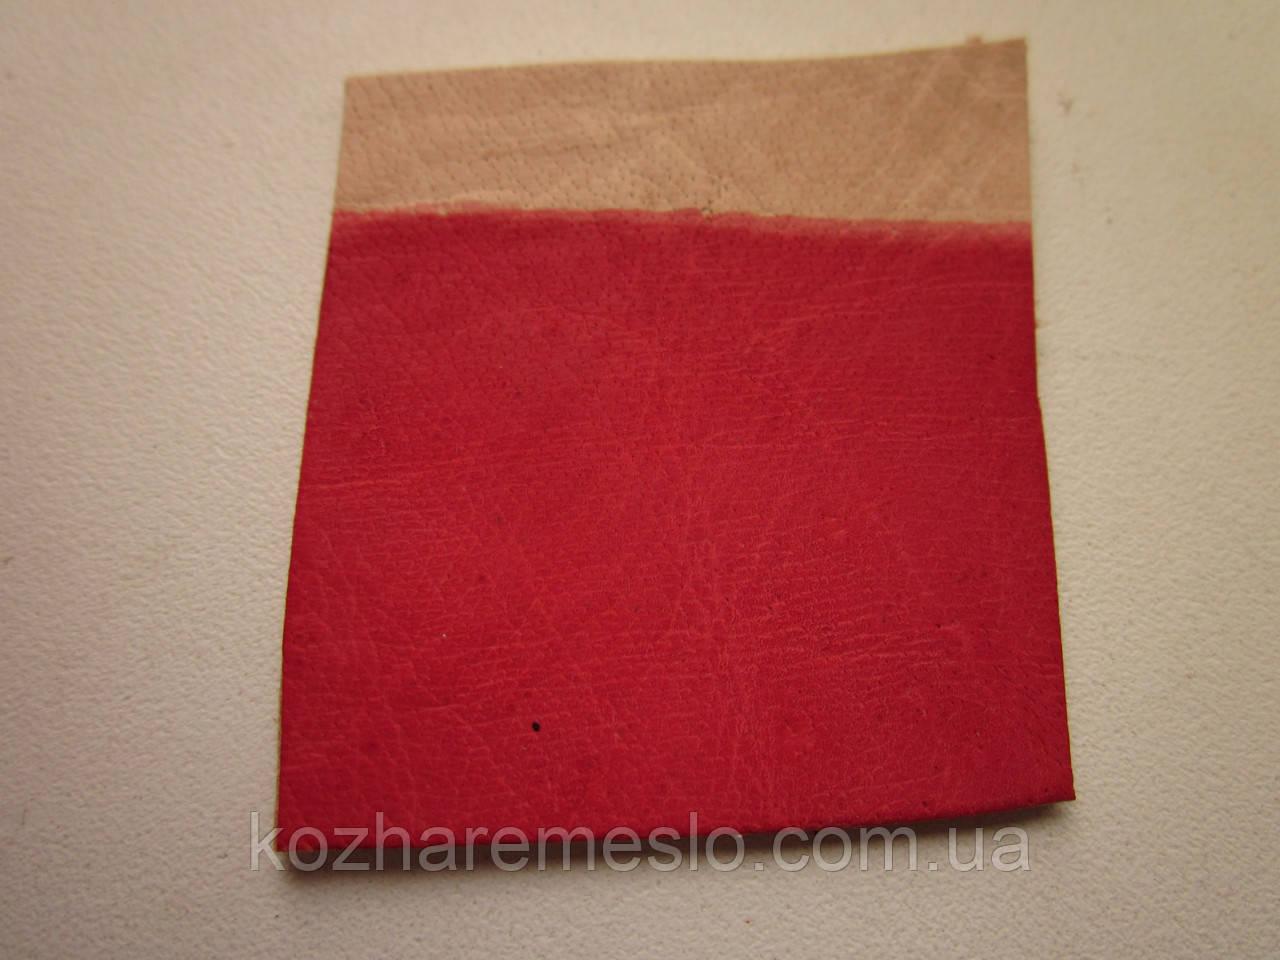 Краска для кожи спиртовая TOLEDO SUPER 200мл ярко - красная